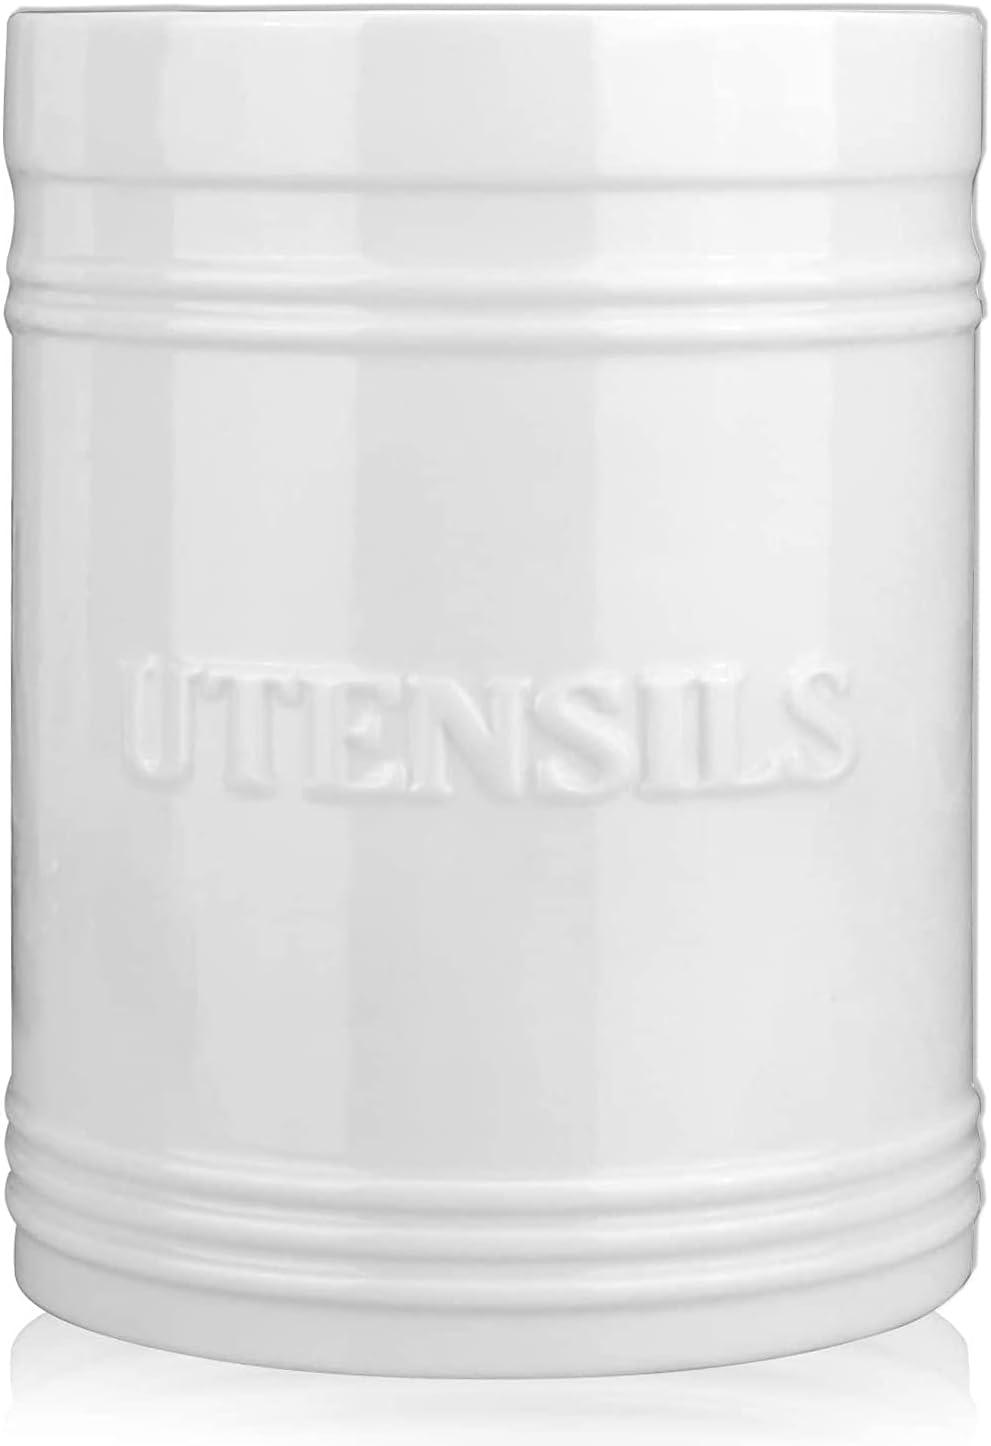 Best White Large Ceramic Utensil Crock Kitchen Spoon Stand Utensil Jar Flatware Caddy Cooking Spoon Utensil Holder Organizer Silverware Holder Stove Top Utensil Holder